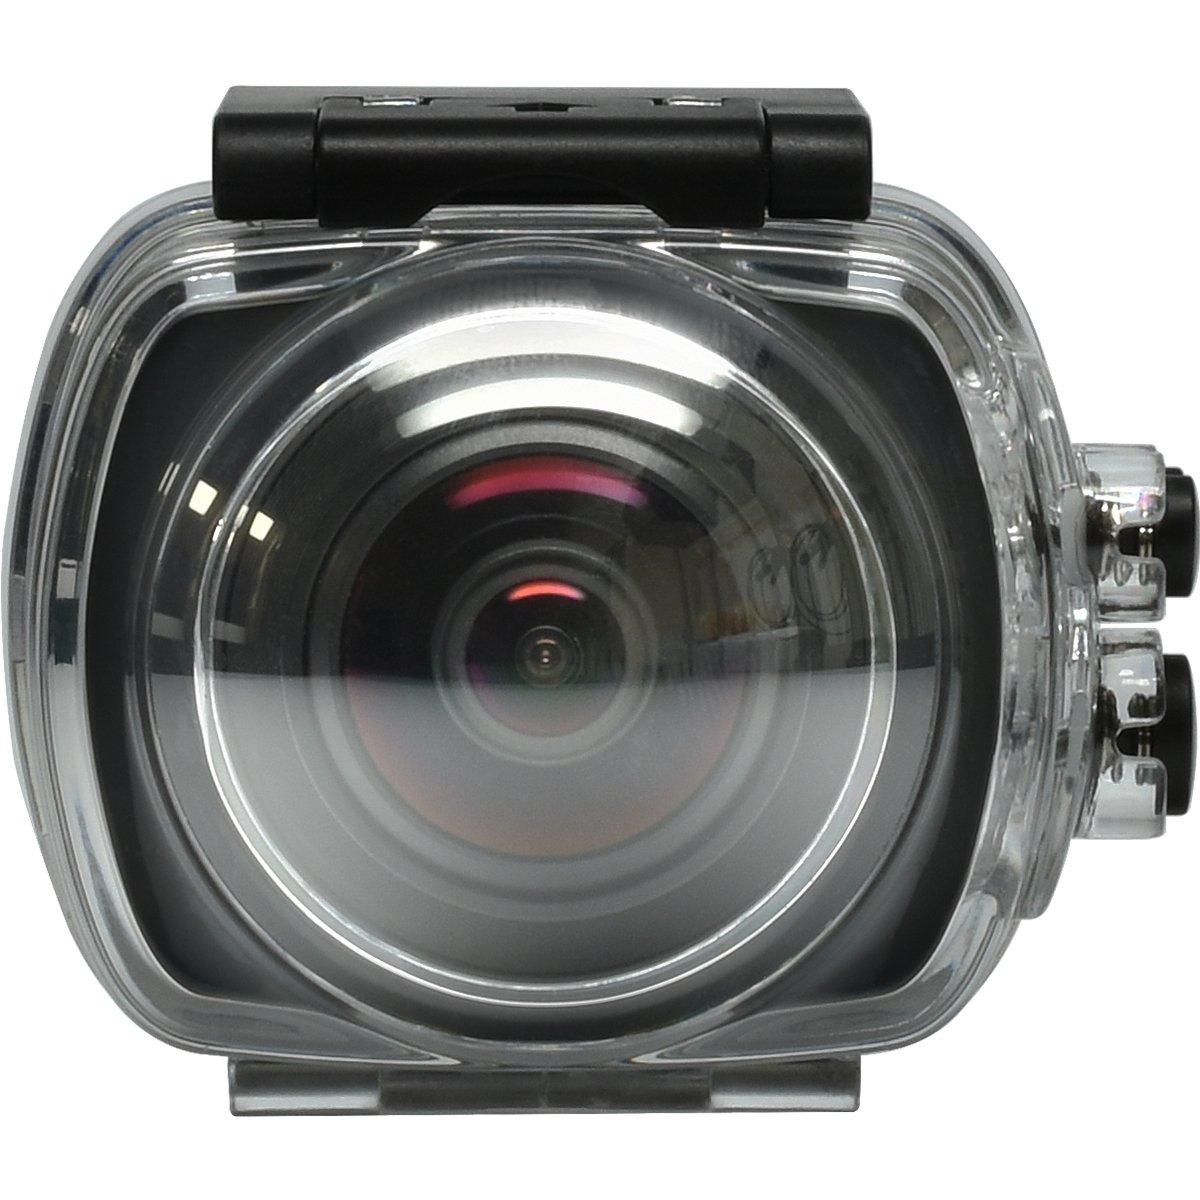 Vivitars DVR968HD 360Cam 12.1 MP Camera with 1080p Resolution DVR968HD-BLK